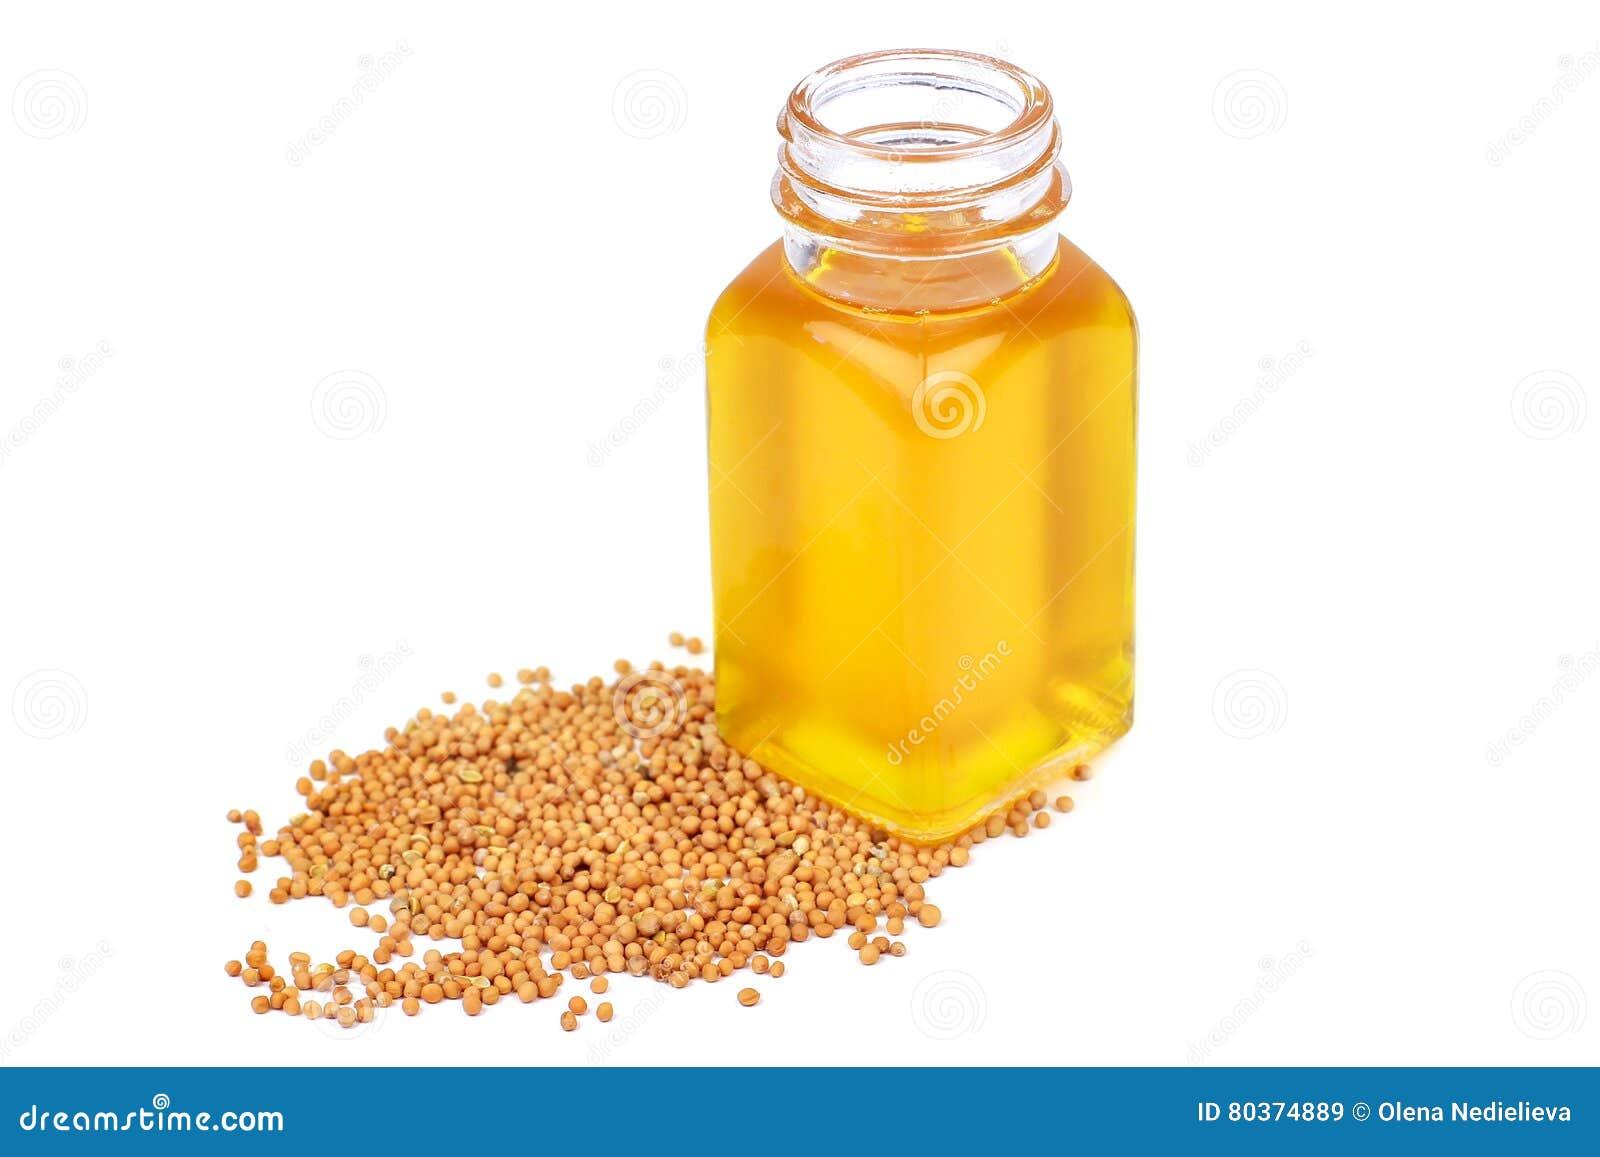 mustard oil bottle stock image cartoondealercom 17560525